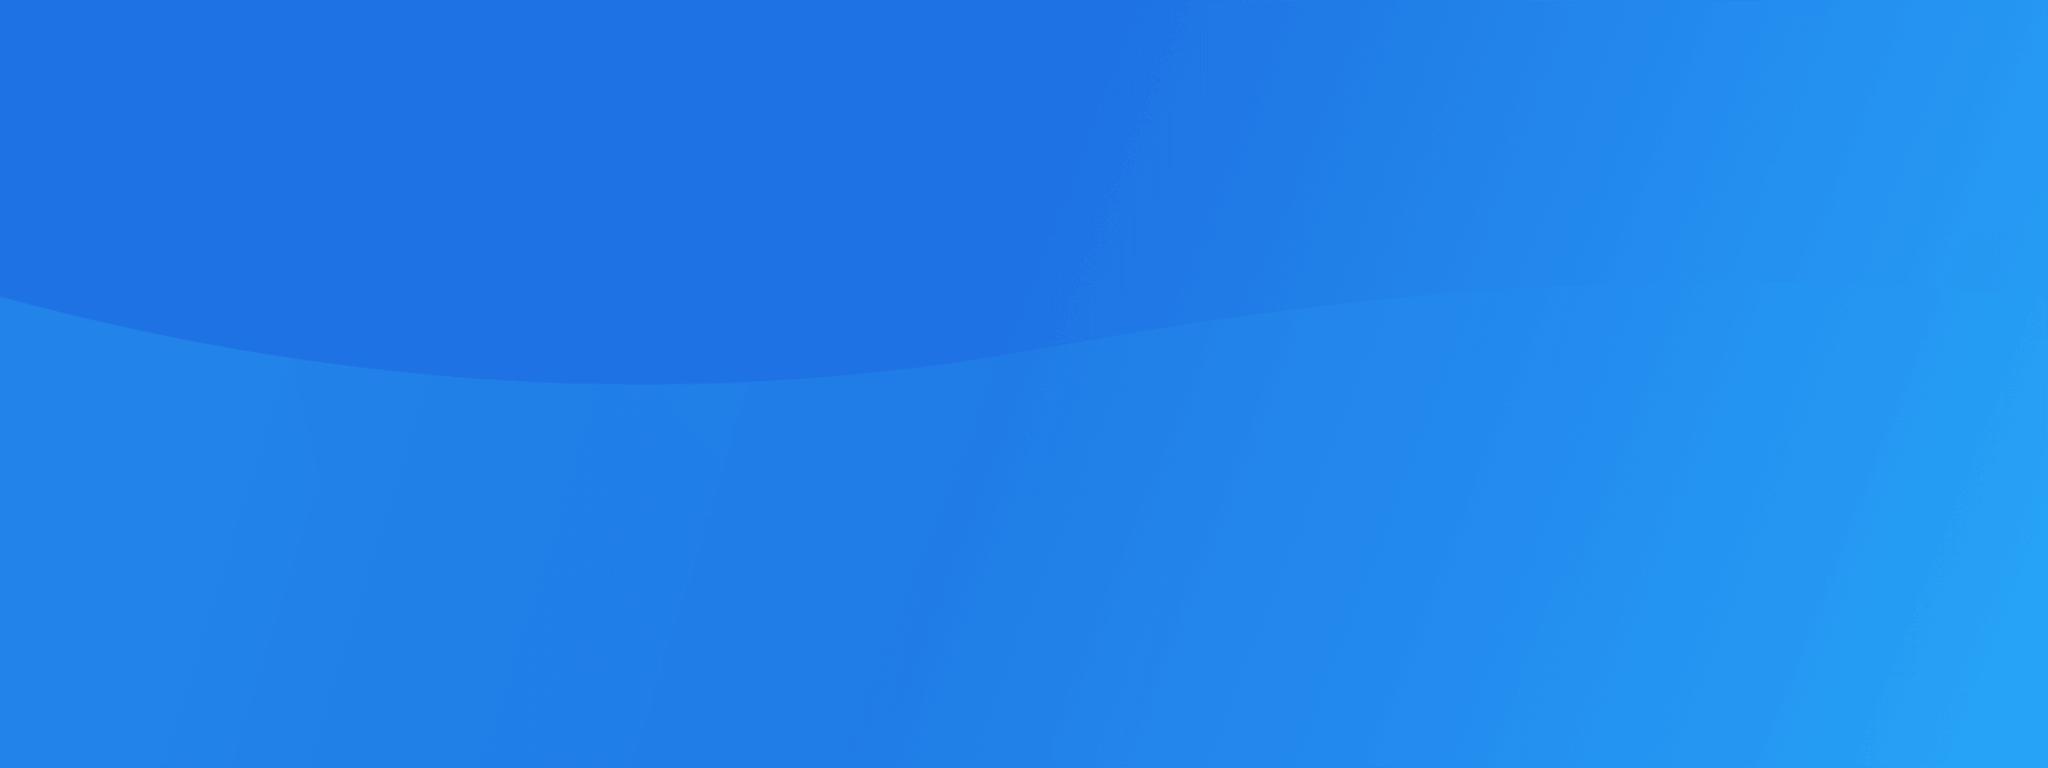 Light Blue Background Image